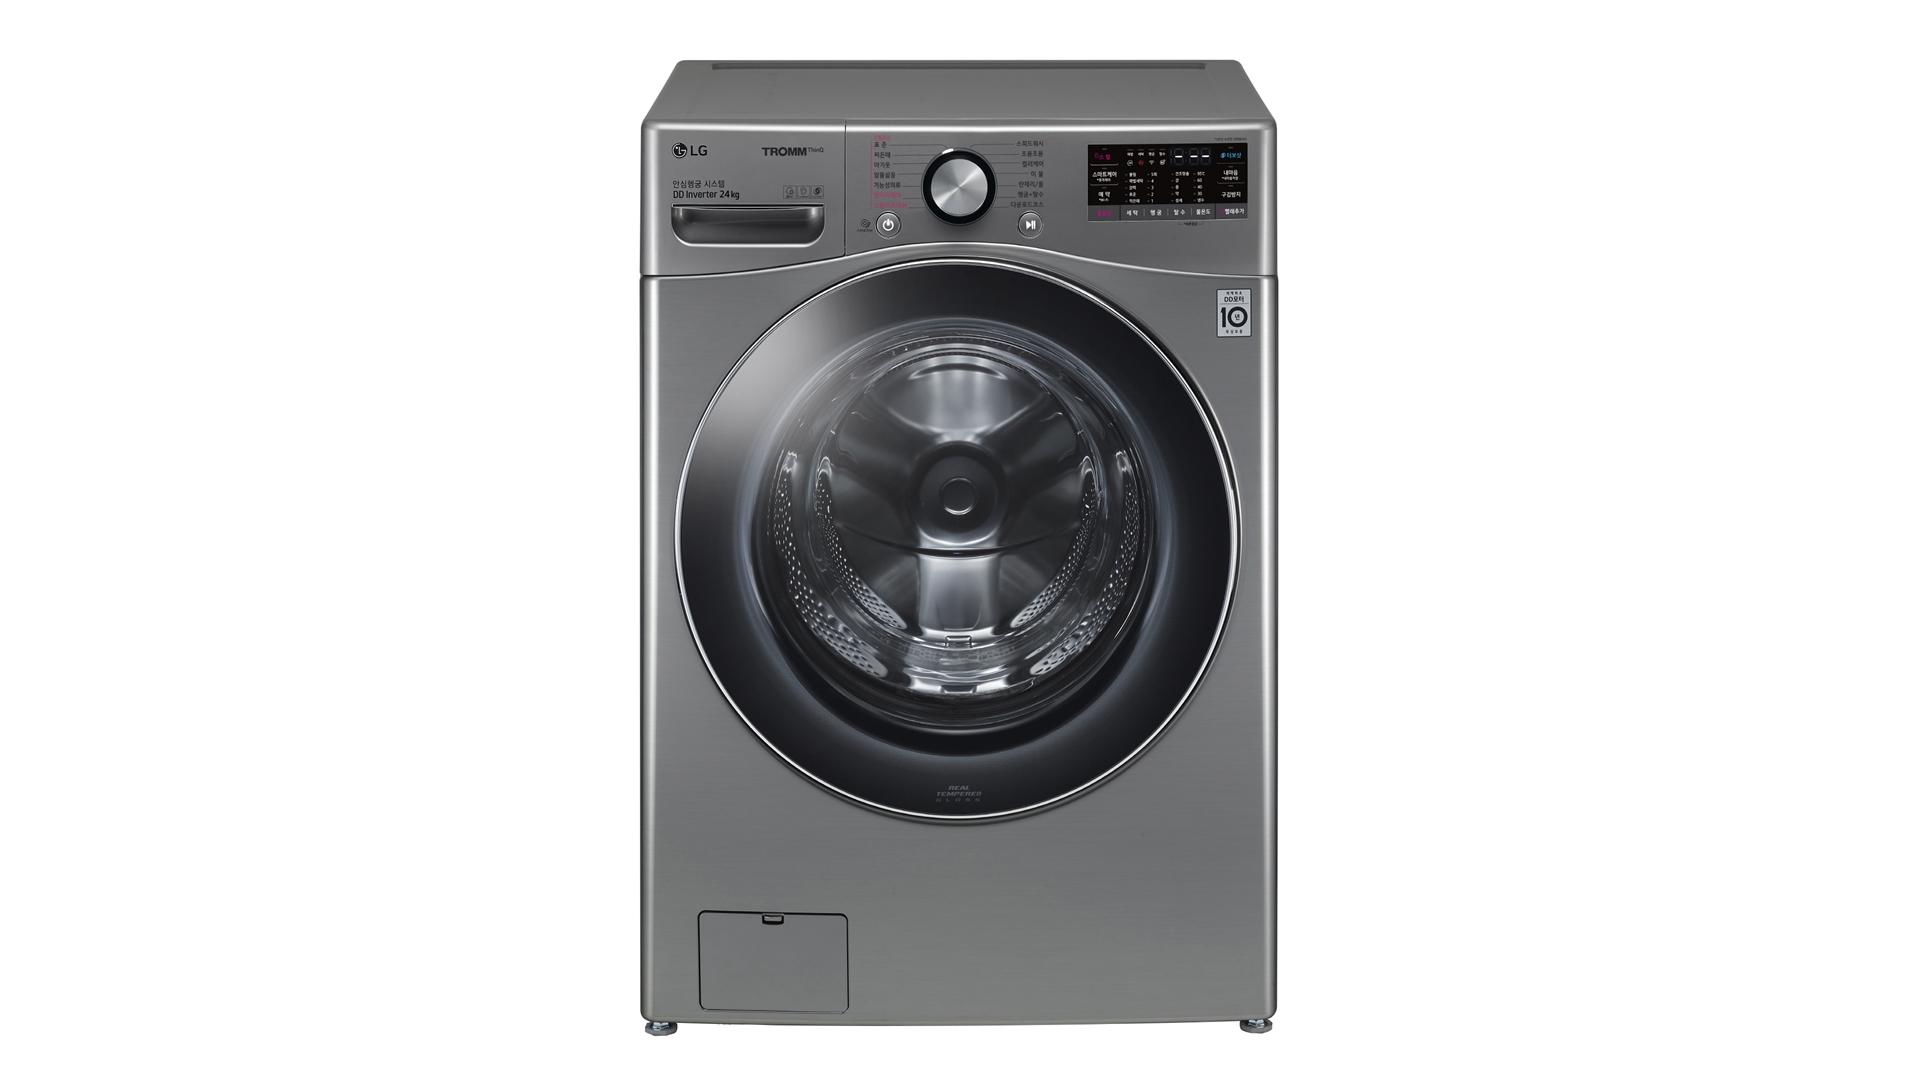 LG전자는 양이 많거나 부피가 큰 빨래도 한 번에 세탁할 수 있는 인공지능 DD(Direct Drive)세탁기 'LG 트롬 세탁기 씽큐'(모델명: F24VDD)를 이번 주말 출시한다.